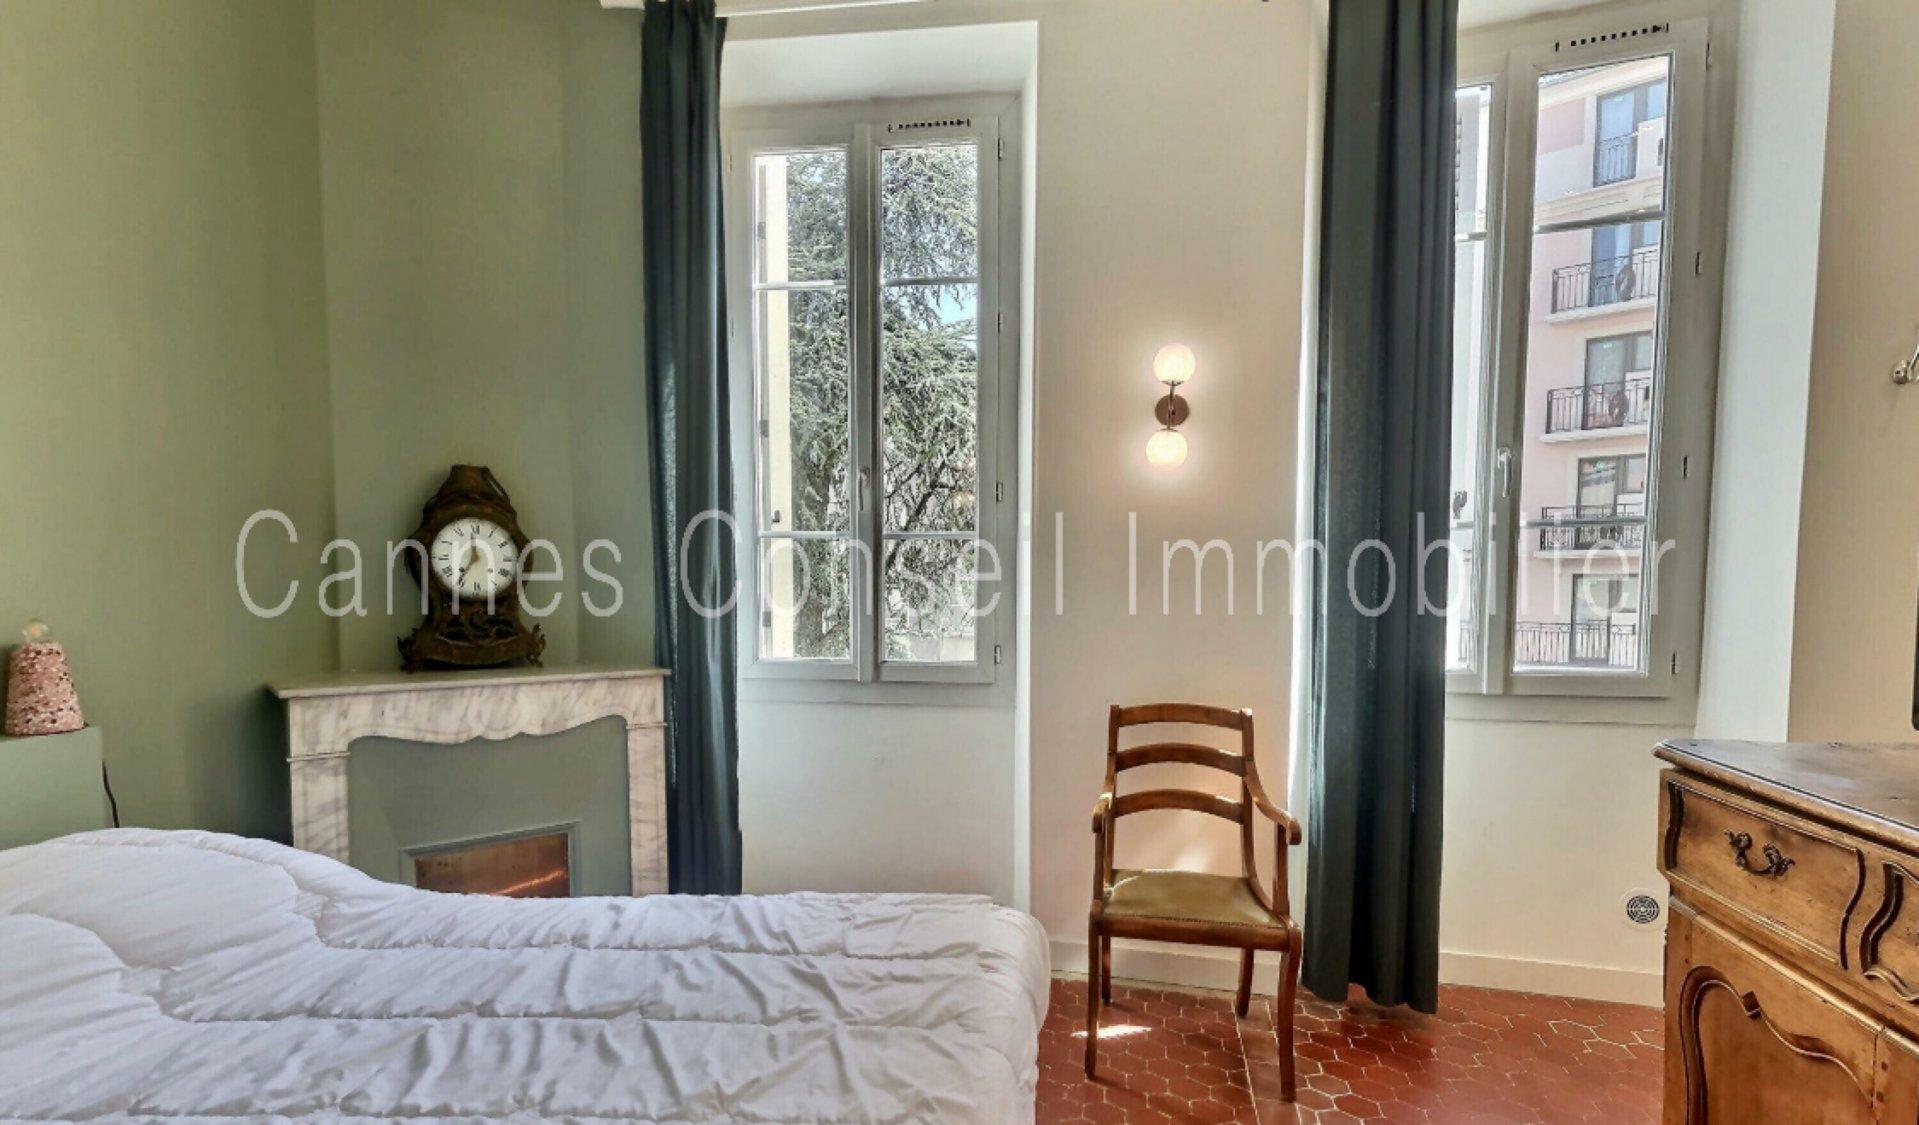 Affitto Appartamento - Cannes Carnot